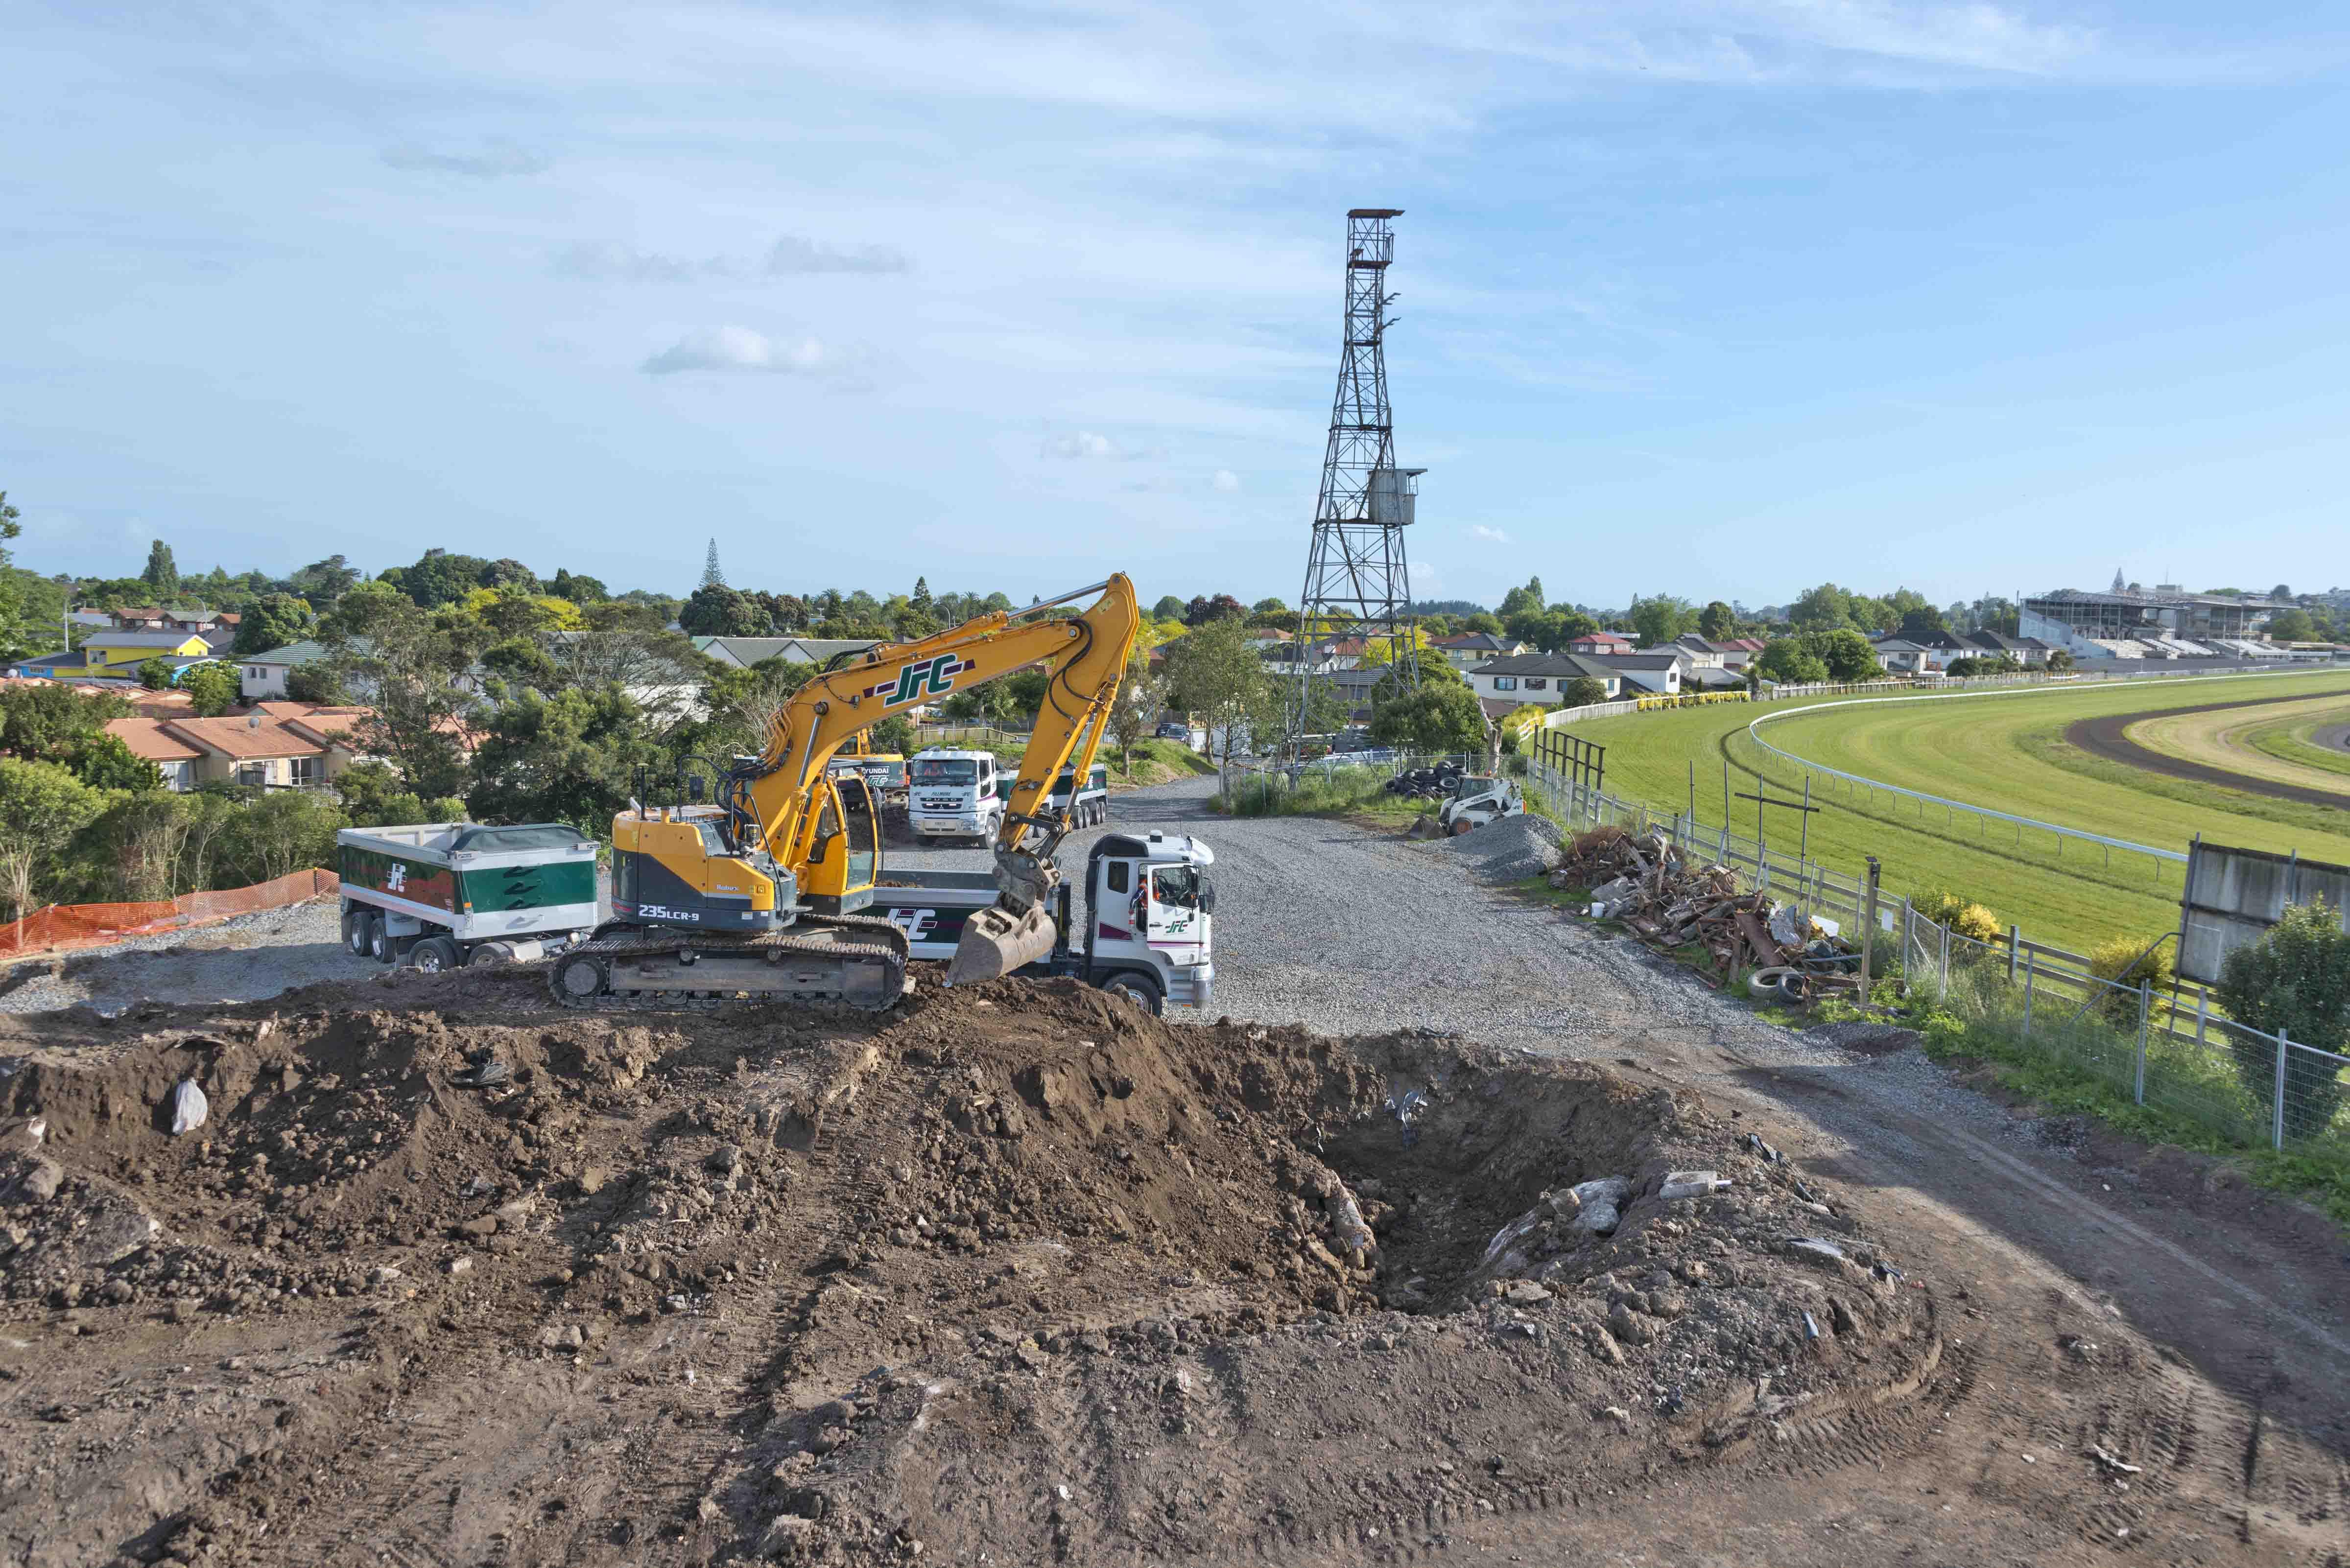 JFC Land develpment earthworks